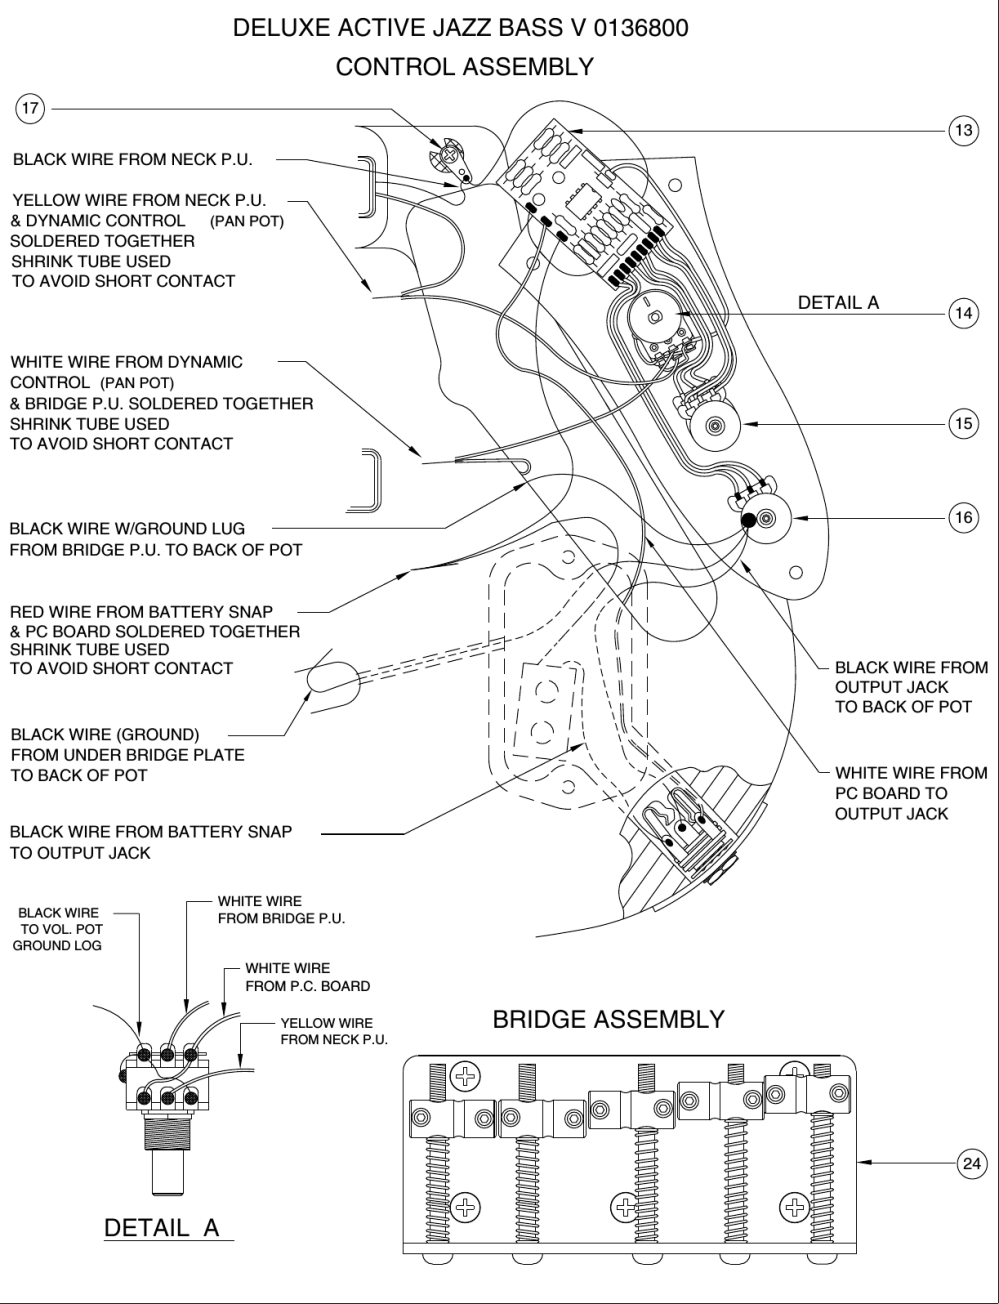 medium resolution of fender deluxe active jazz bas wiring diagram